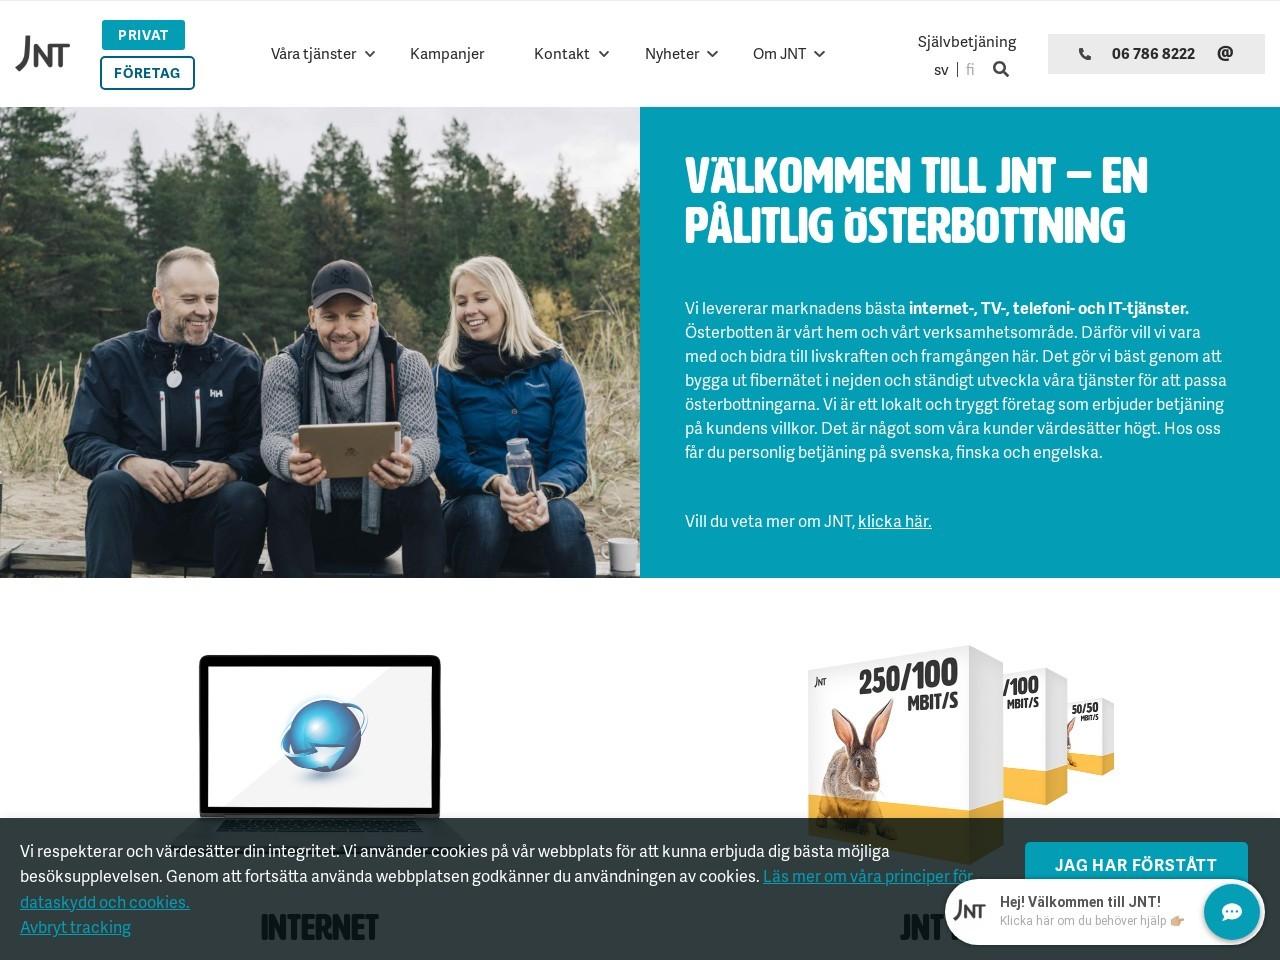 jnt.fi